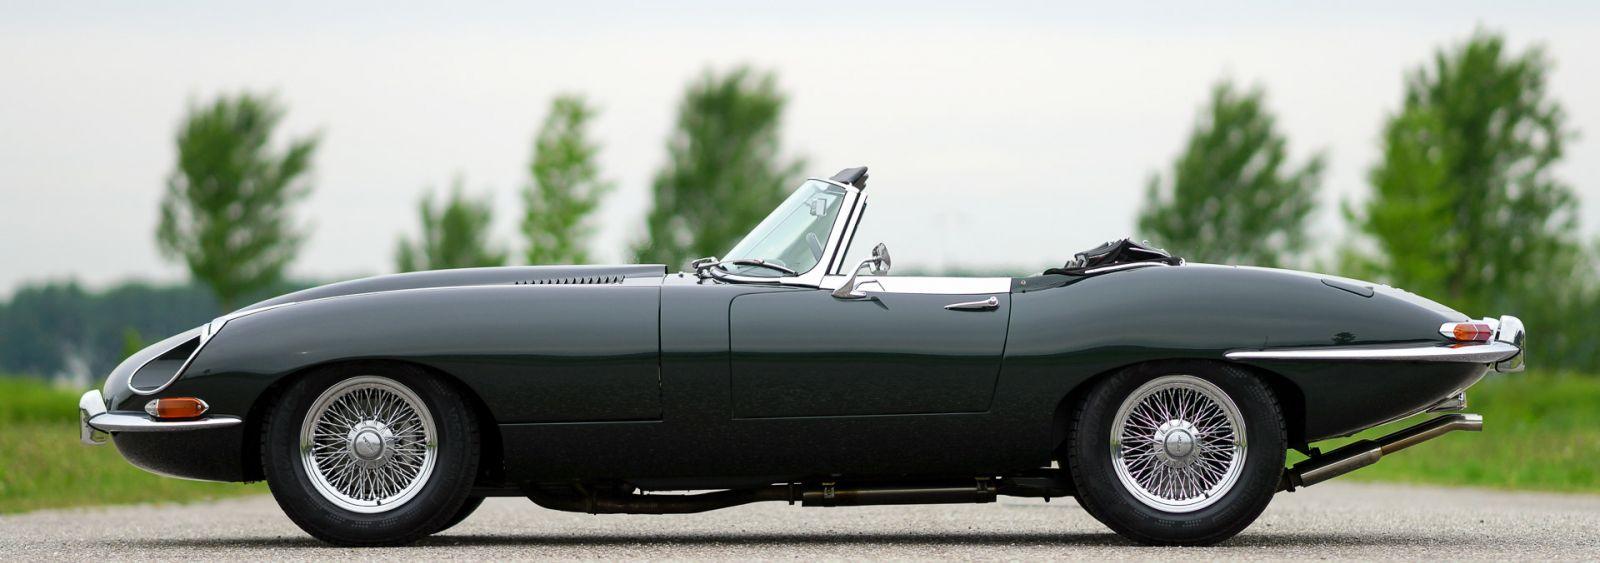 Jaguar E Type 4 2 Litre Ots 1969 Welcome To Classicargarage